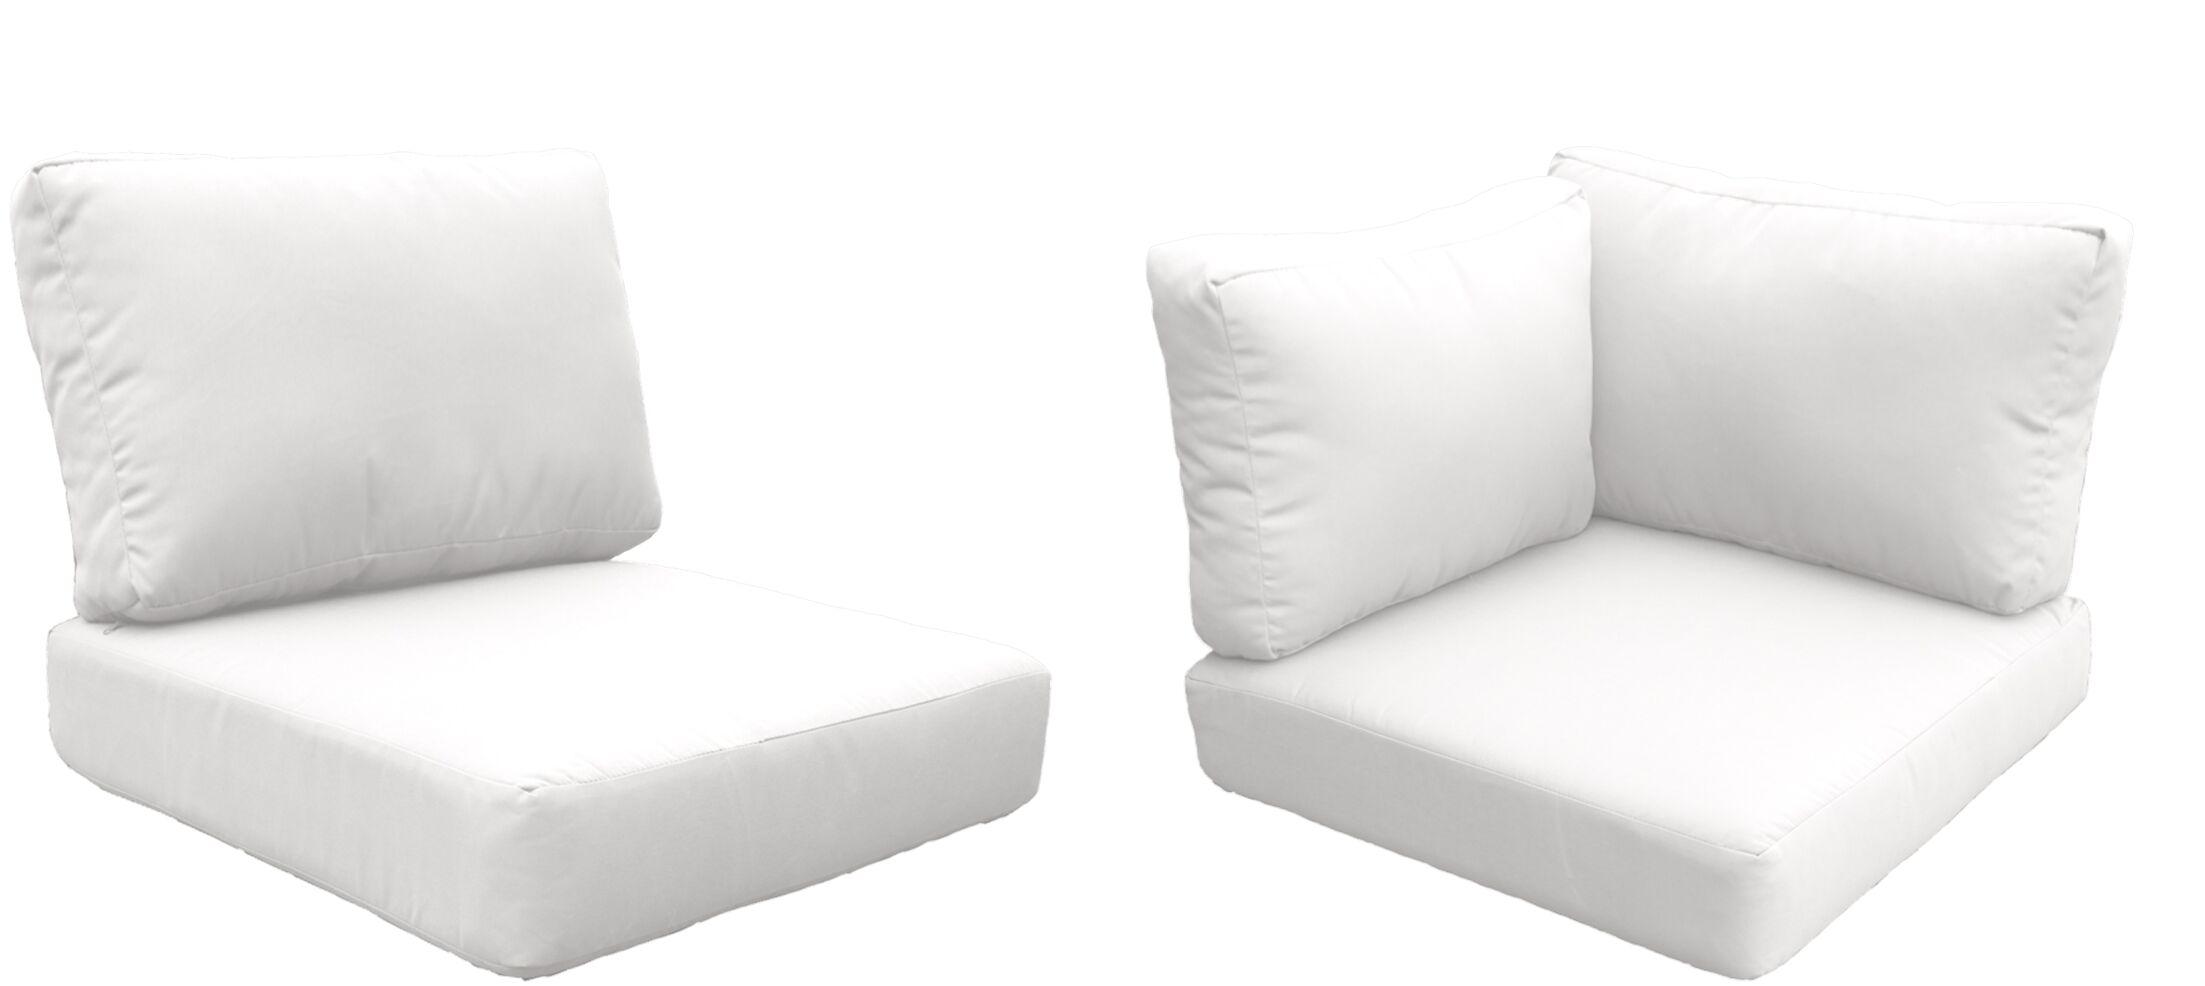 Eldredge Outdoor 10 Piece Lounge Chair Cushion Set Fabric: White